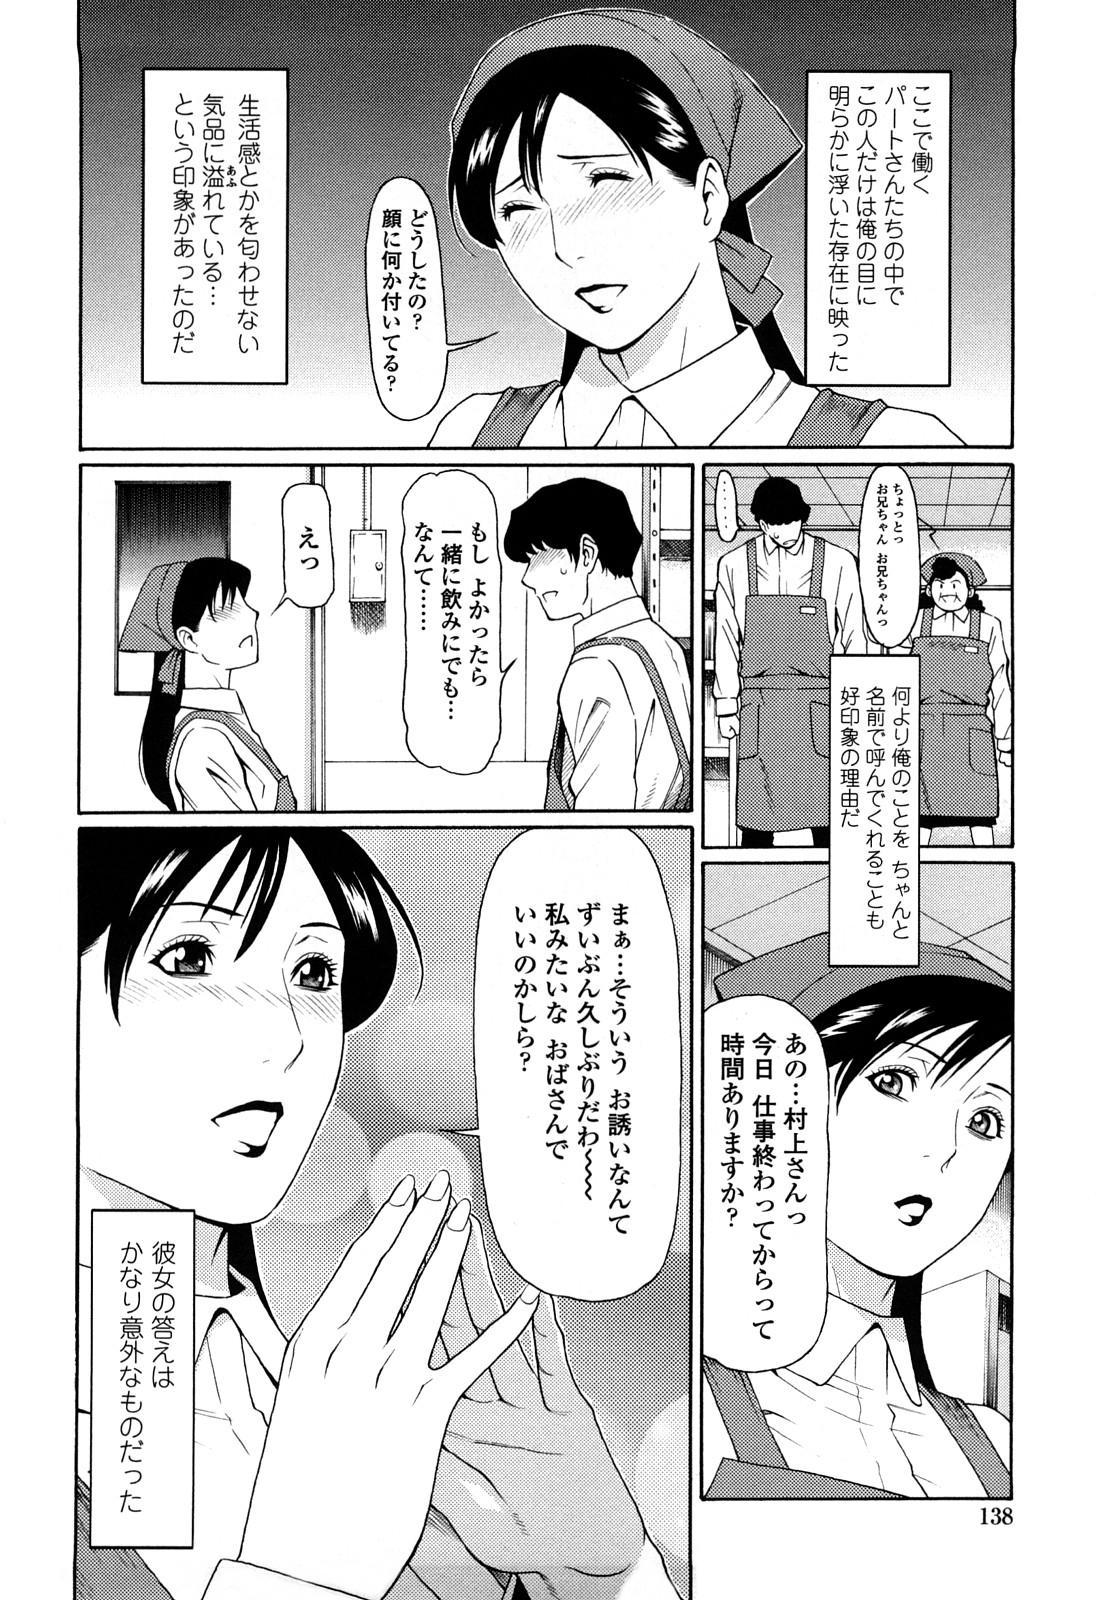 [Takasugi Kou] Kindan no Haha-Ana - Immorality Love-Hole [Decensored] 139